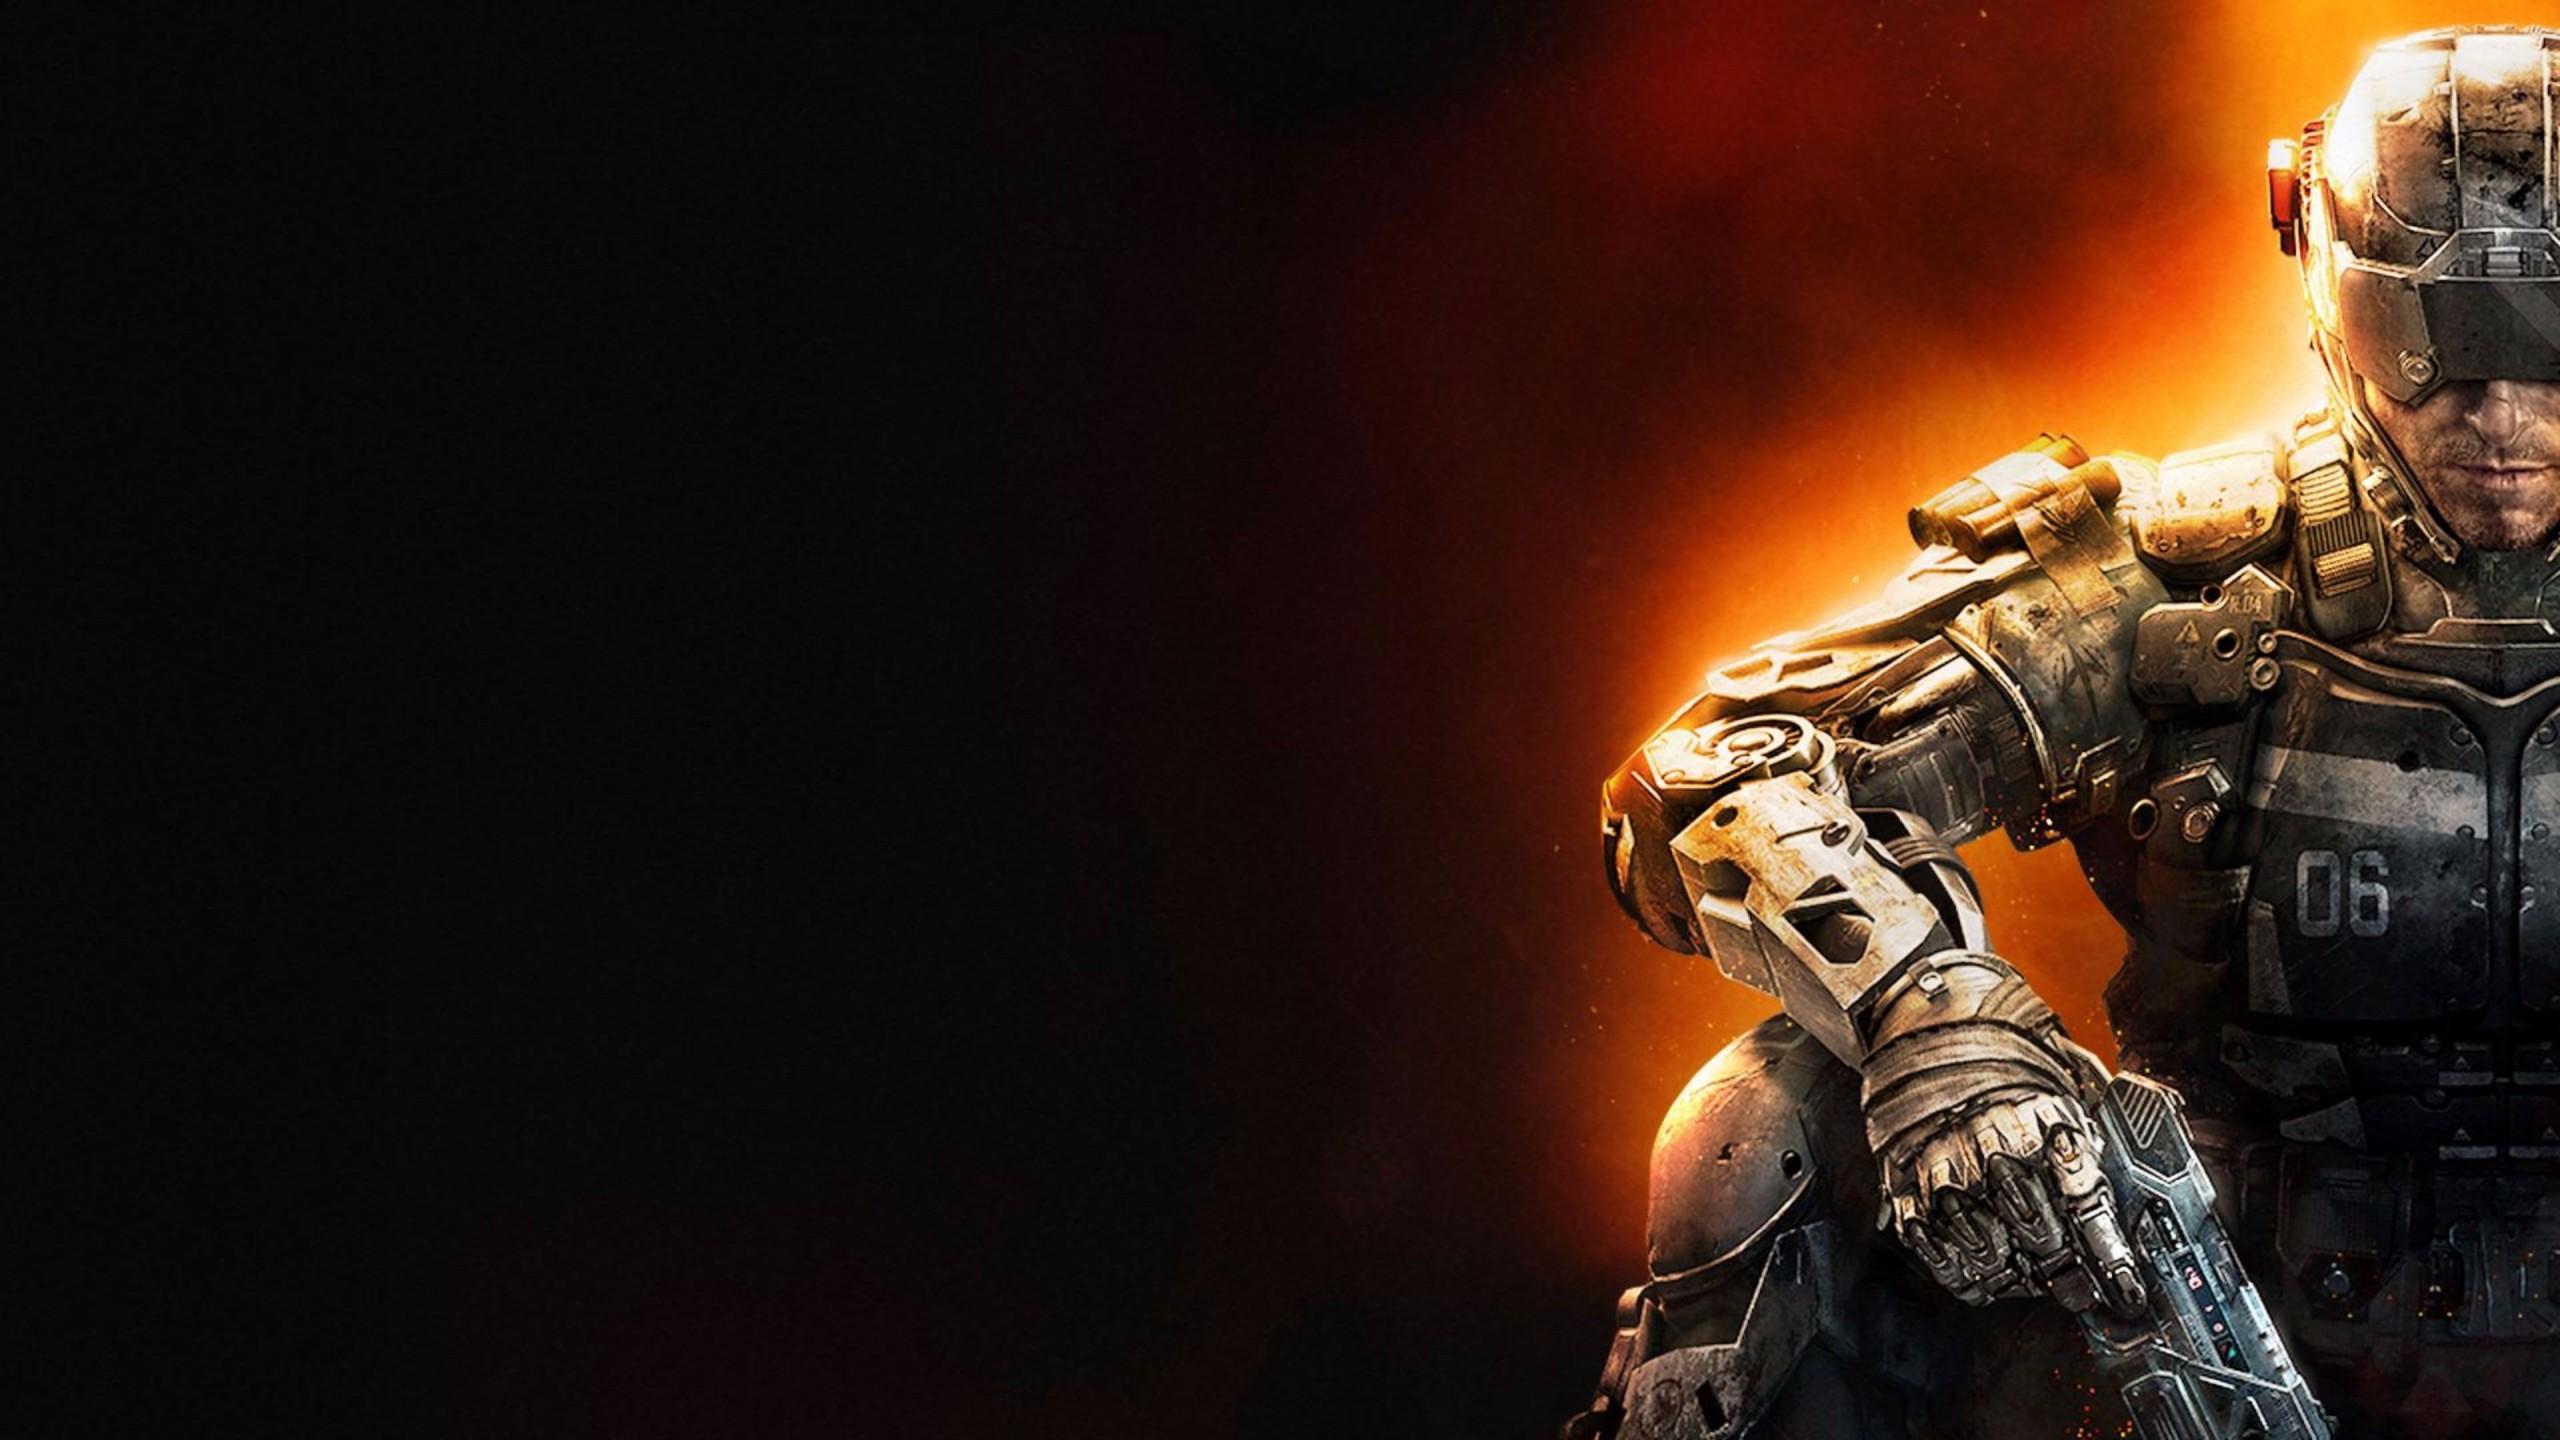 2016 Call of Duty Black Ops 3 4K Wallpaper 4K Wallpaper 2560x1440